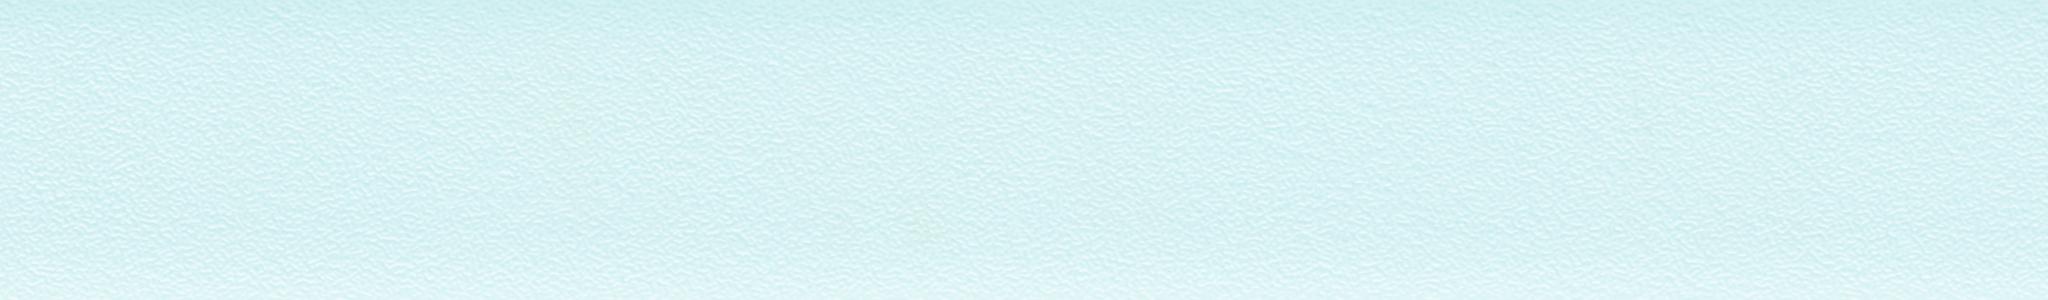 HU 15130 ABS Edge Light Blue Pearl 101